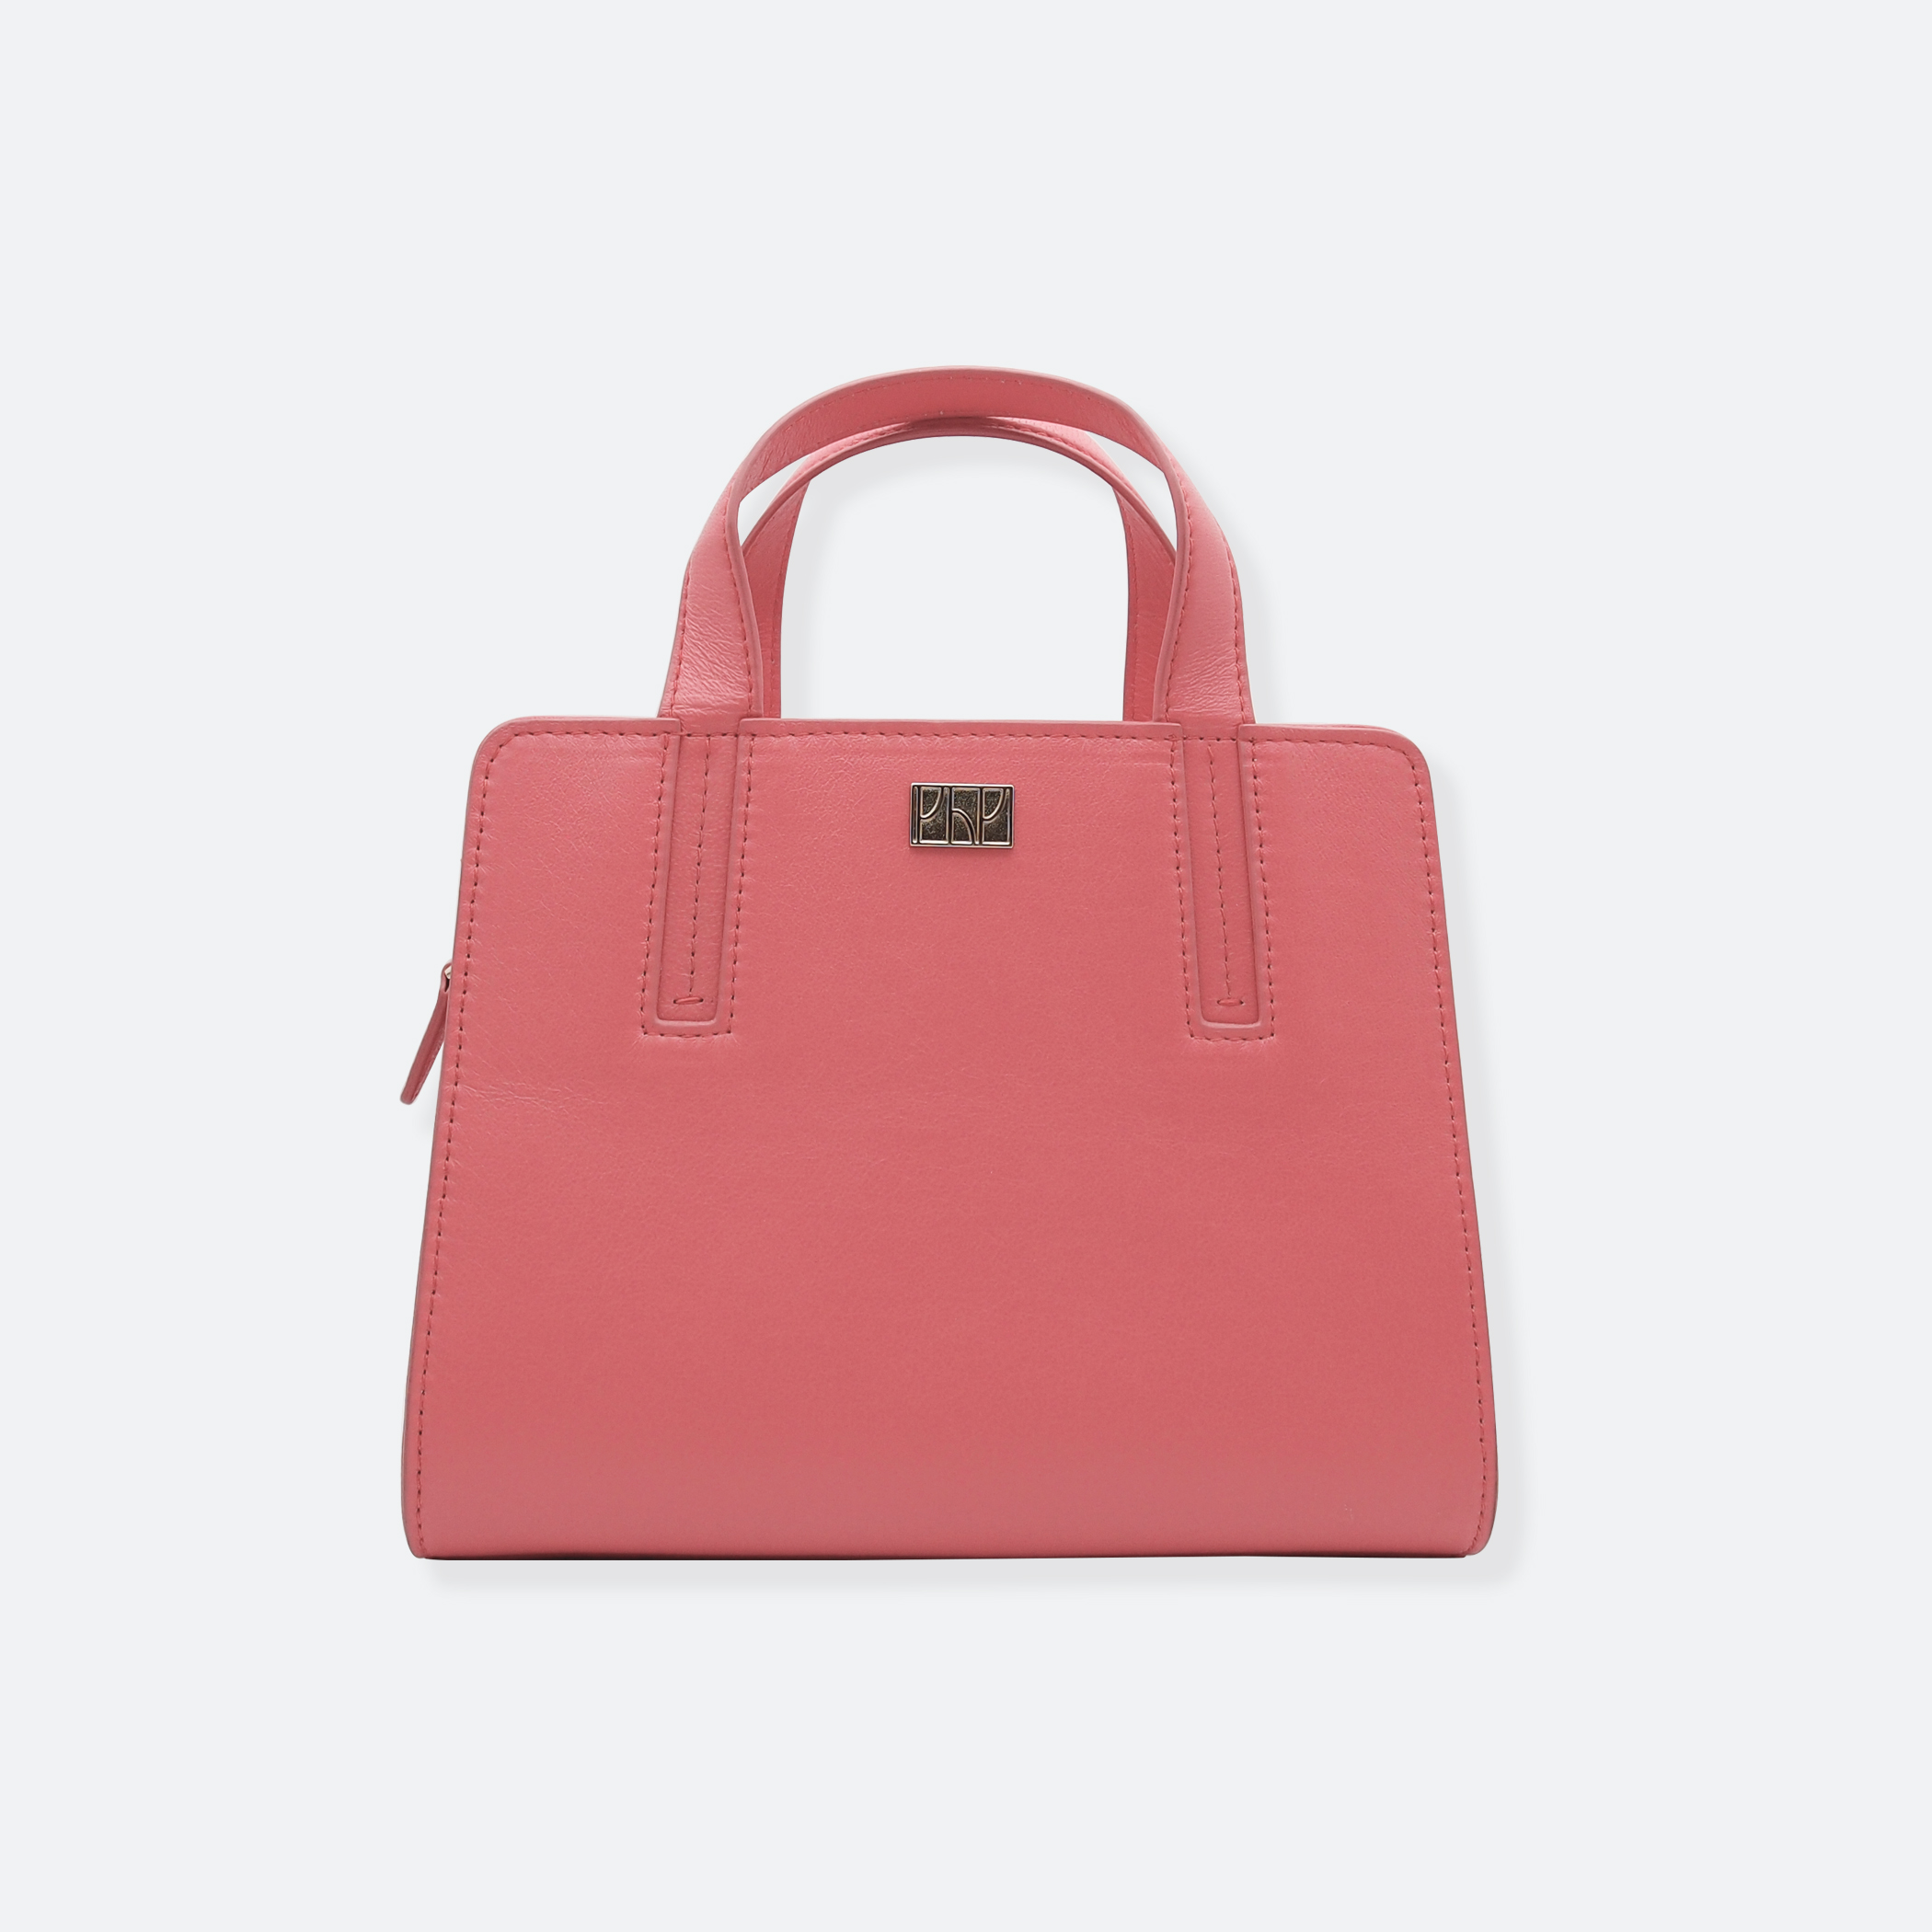 OhMart B043 (Pink) 1